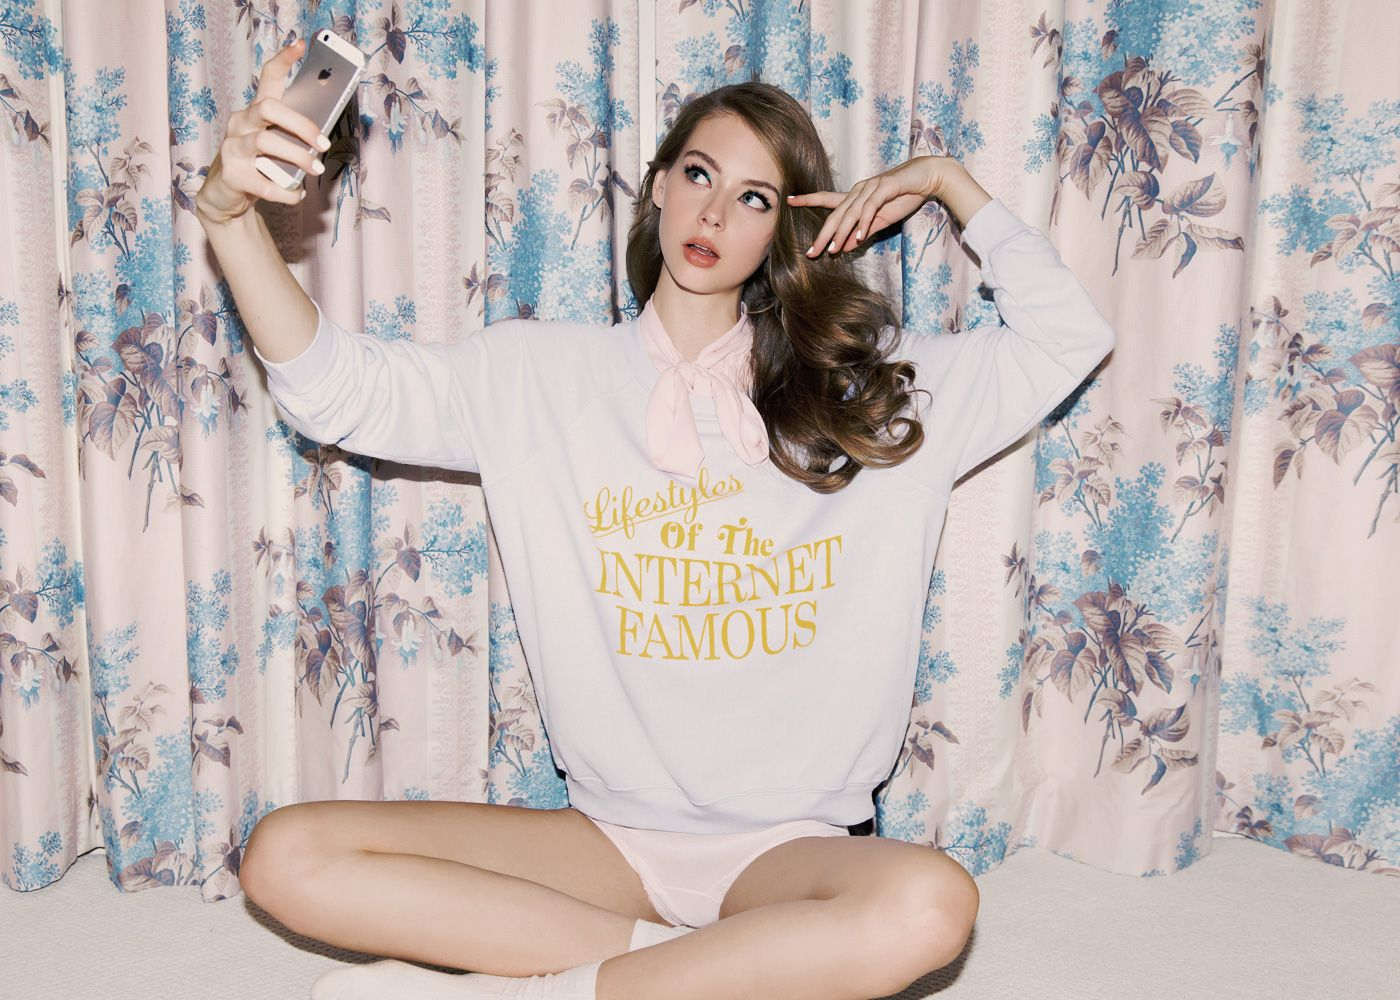 Selfie Lauren Summer nudes (95 foto and video), Tits, Sideboobs, Boobs, in bikini 2018